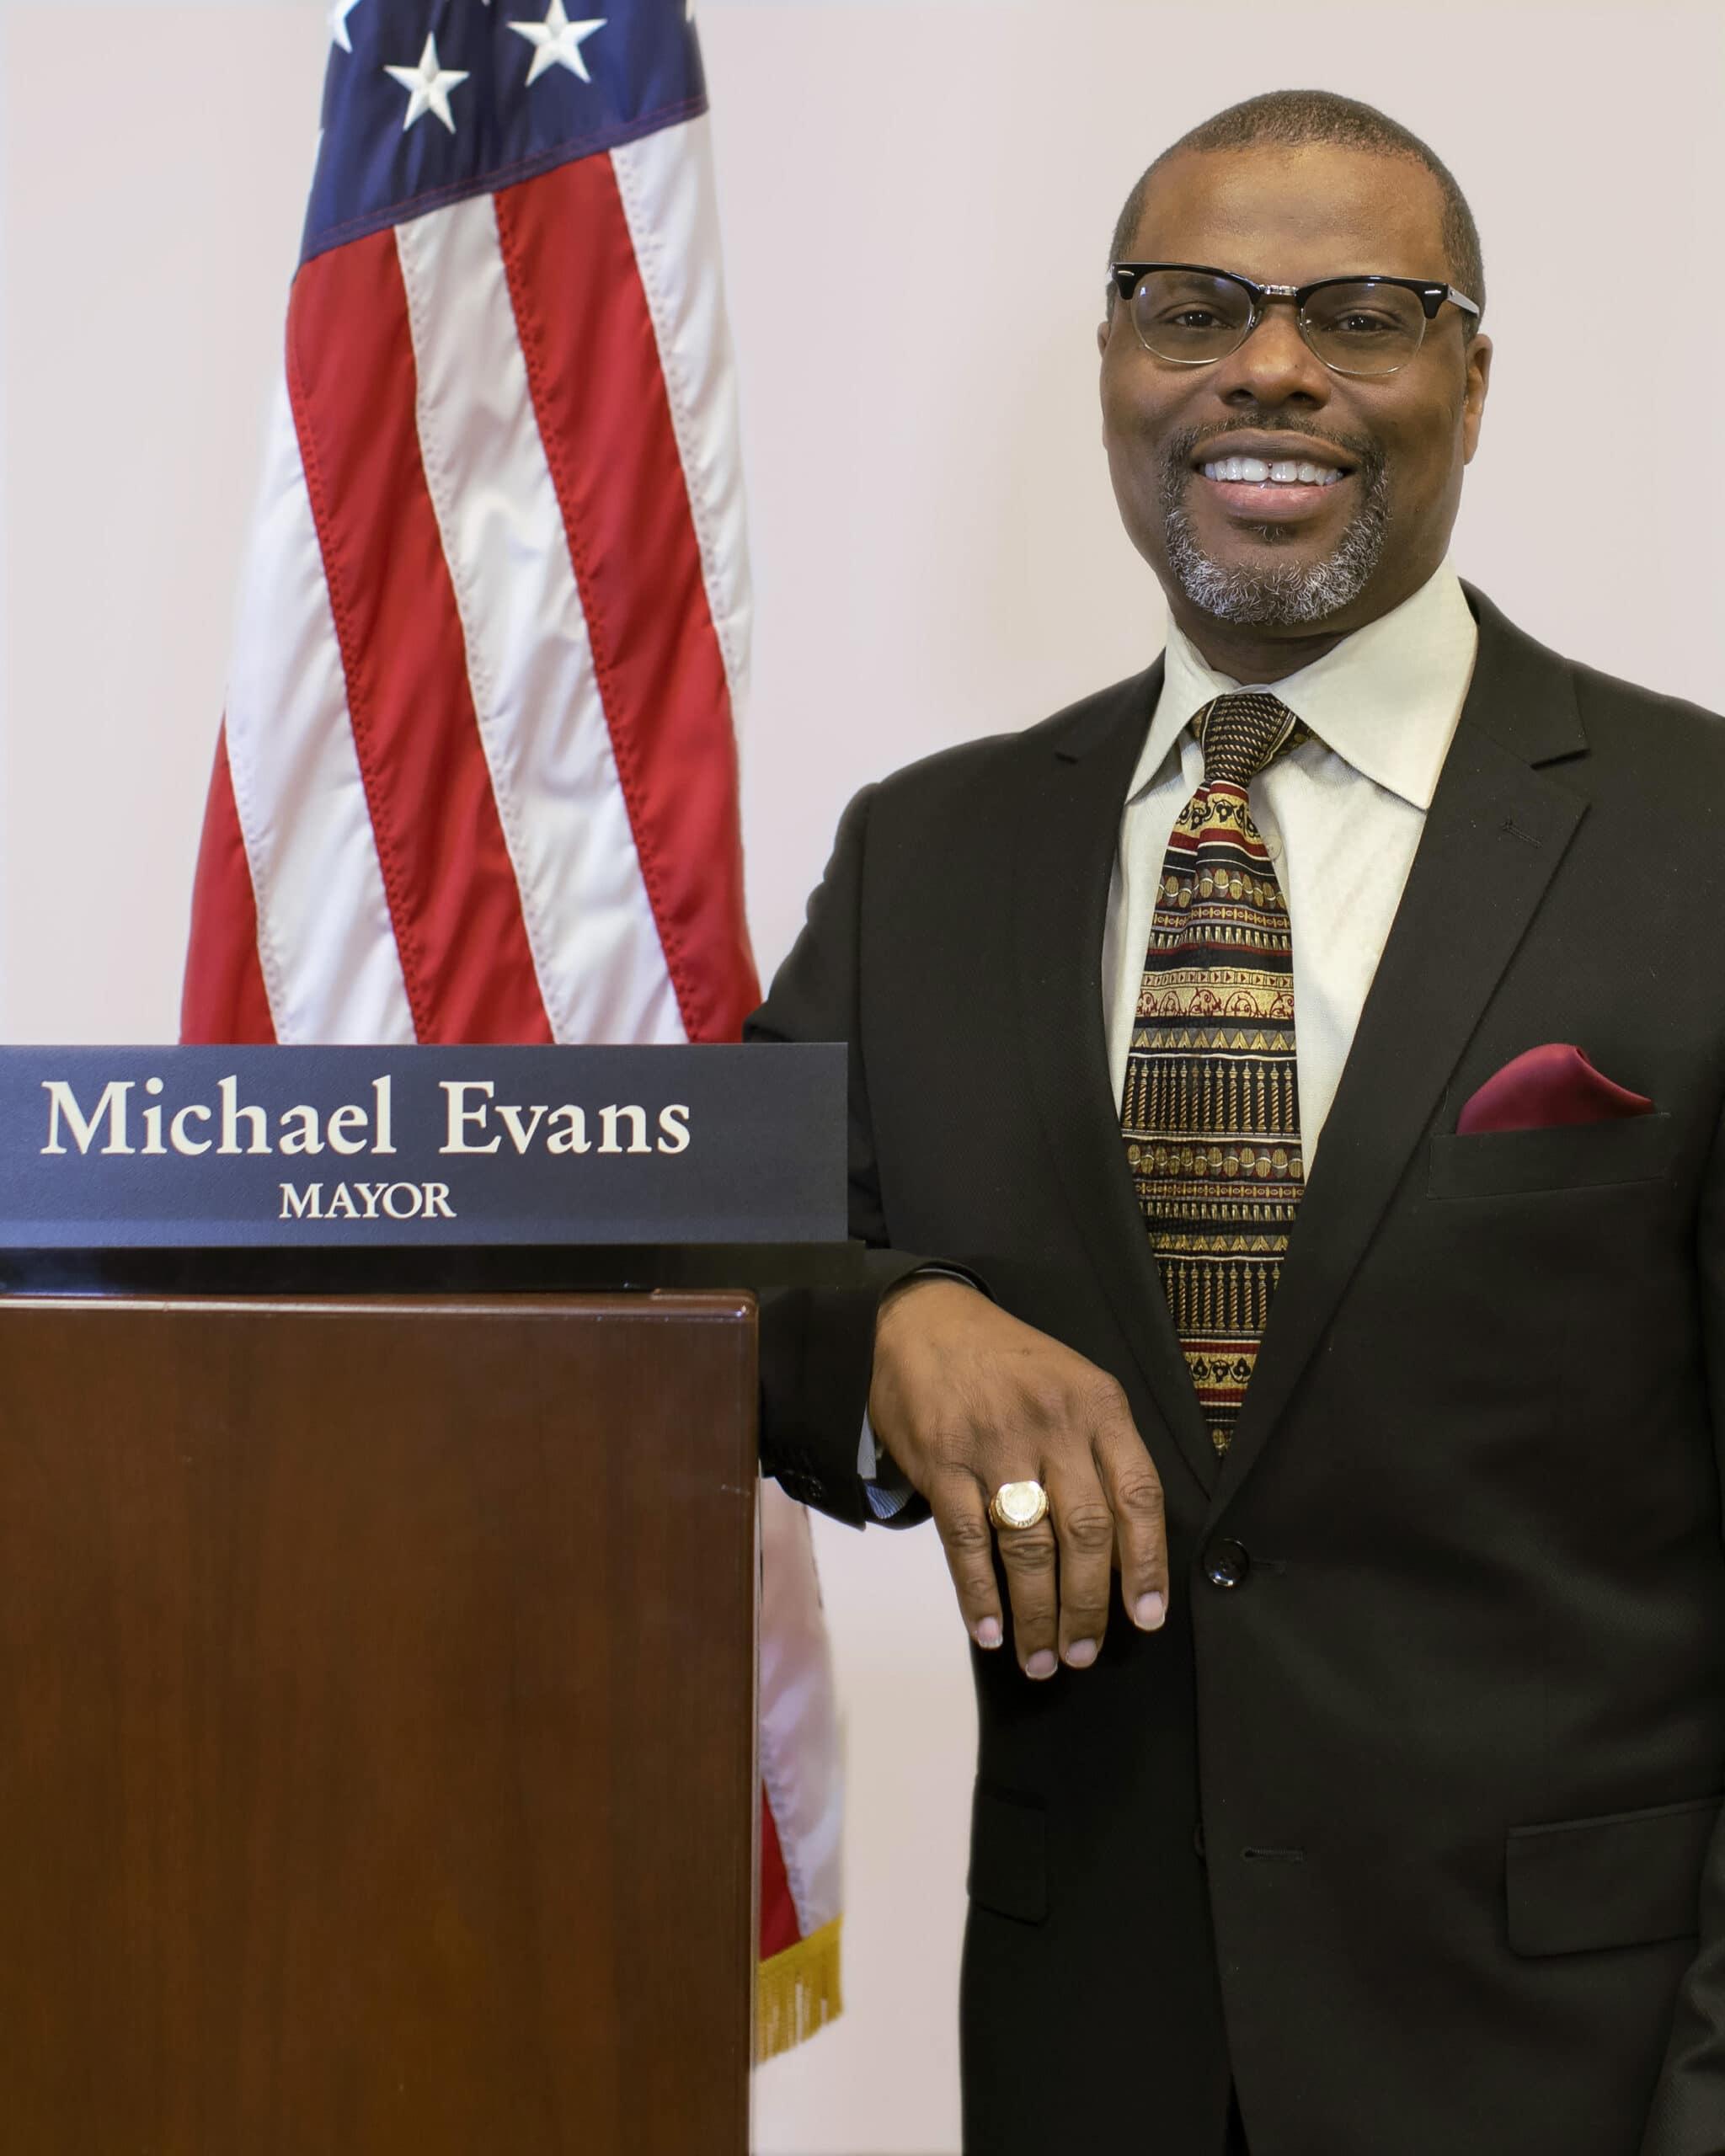 Michael Evans headshot